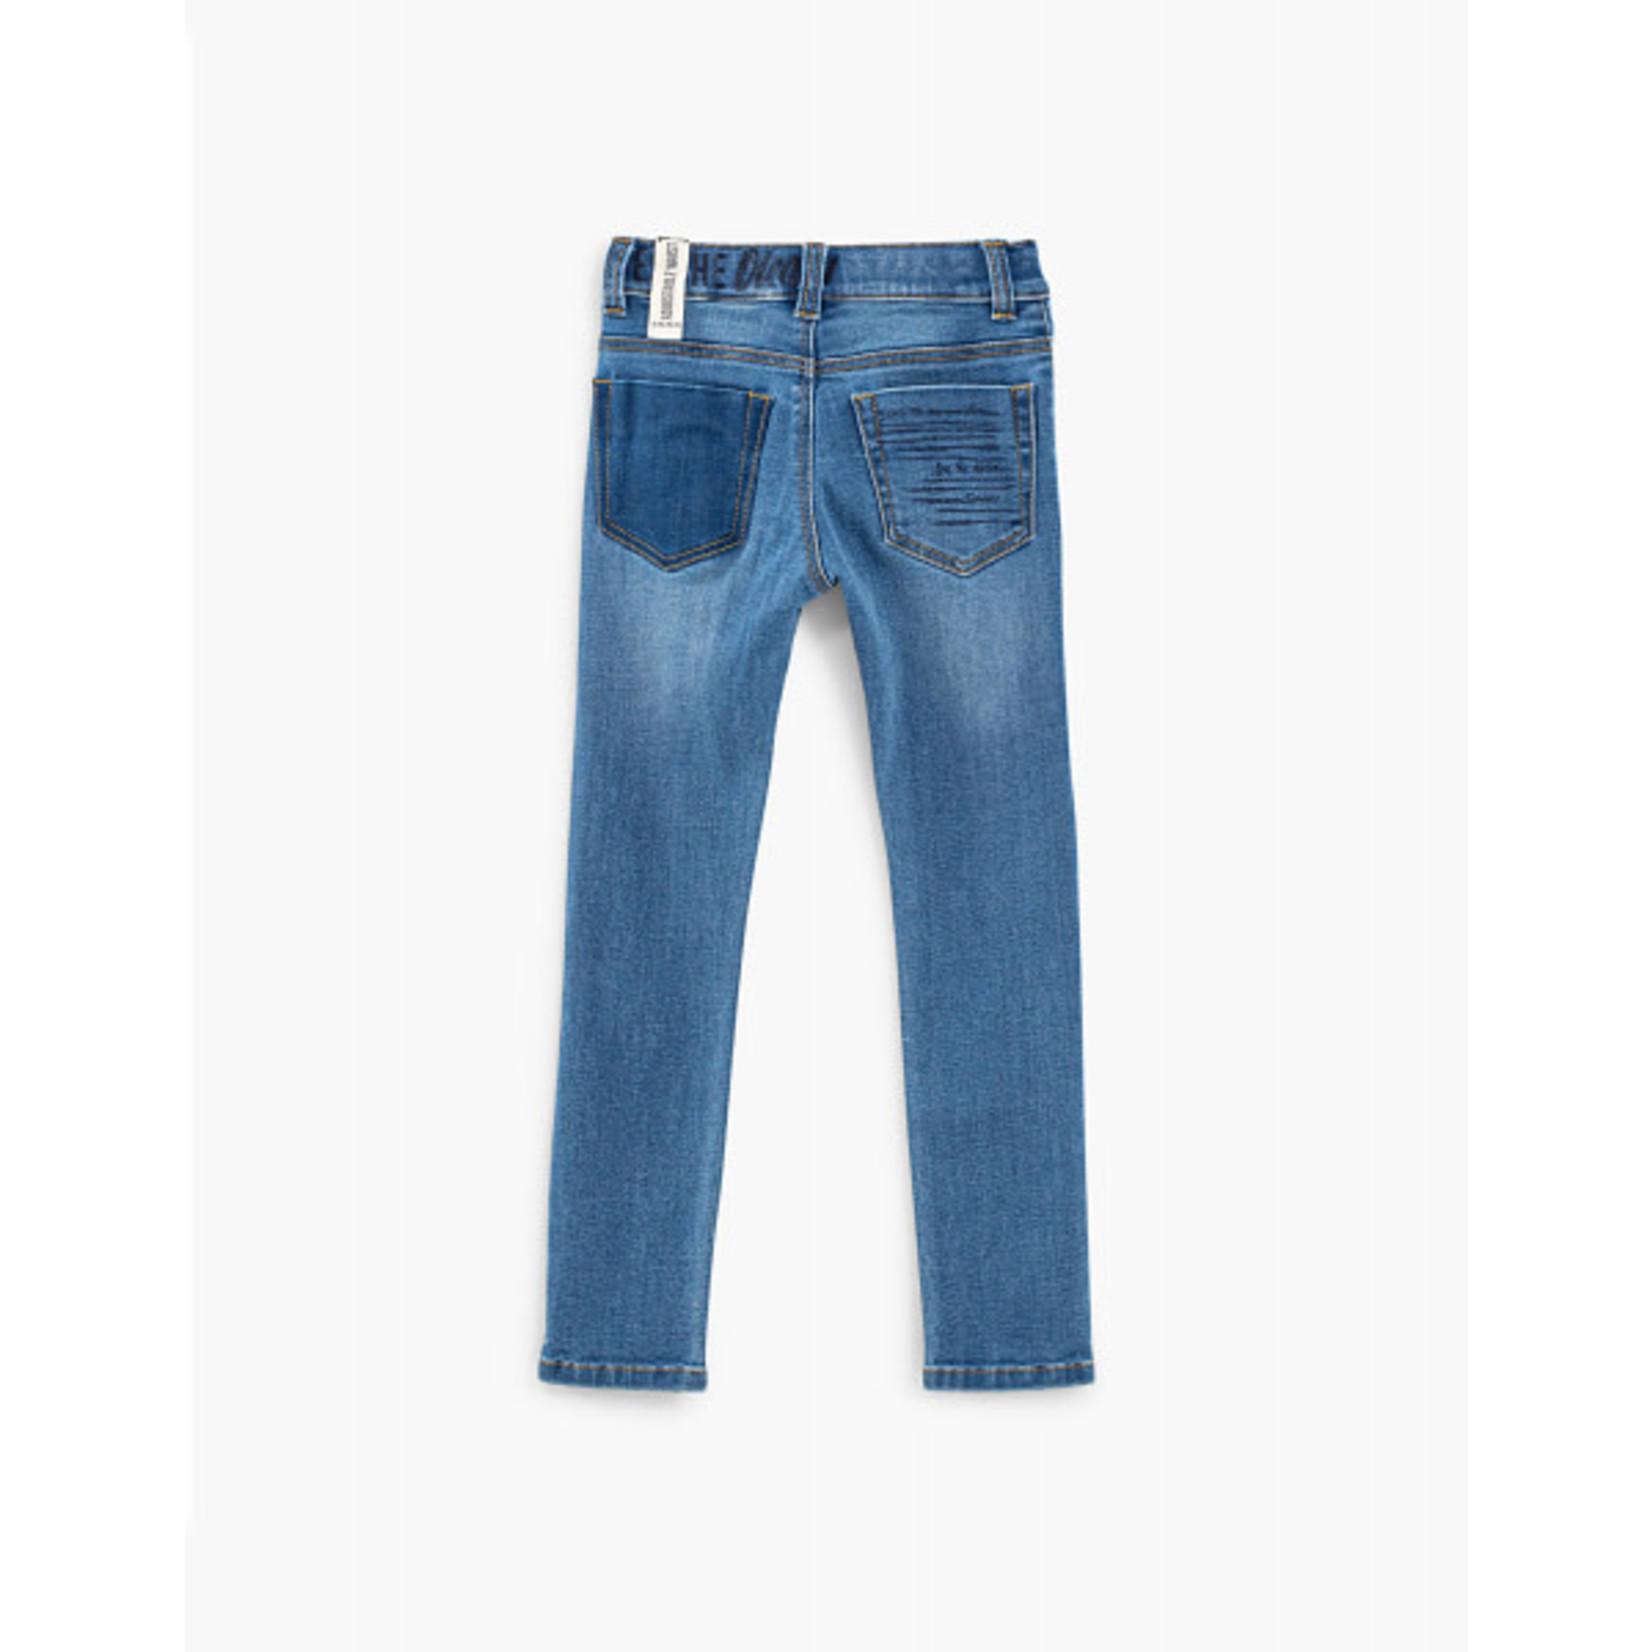 IKKS Jeans Love of the ocean XS29043